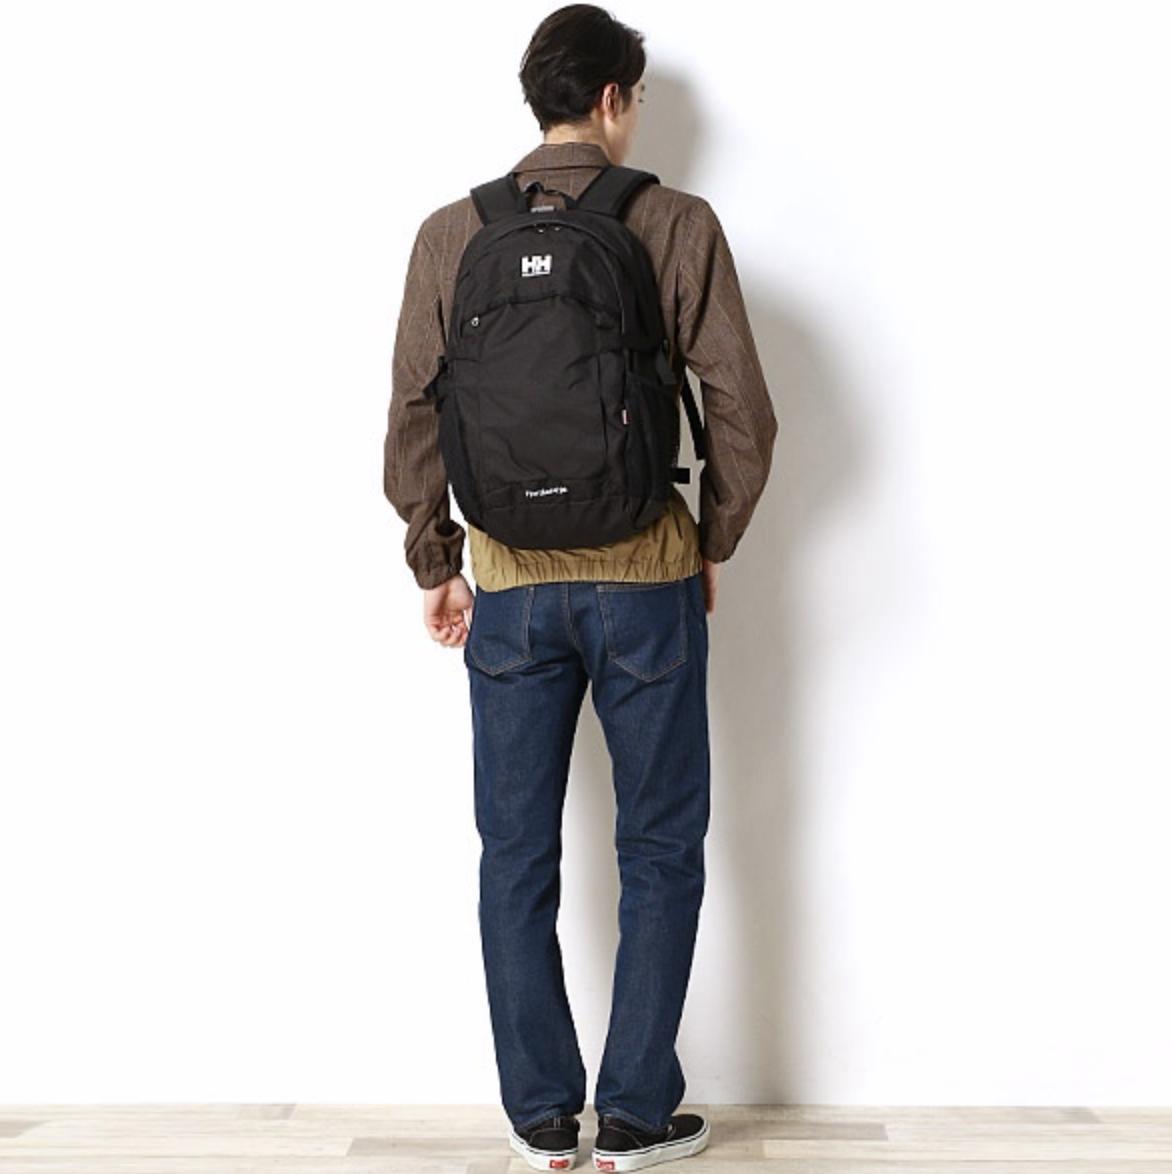 f:id:thebackpack:20190518135049p:plain